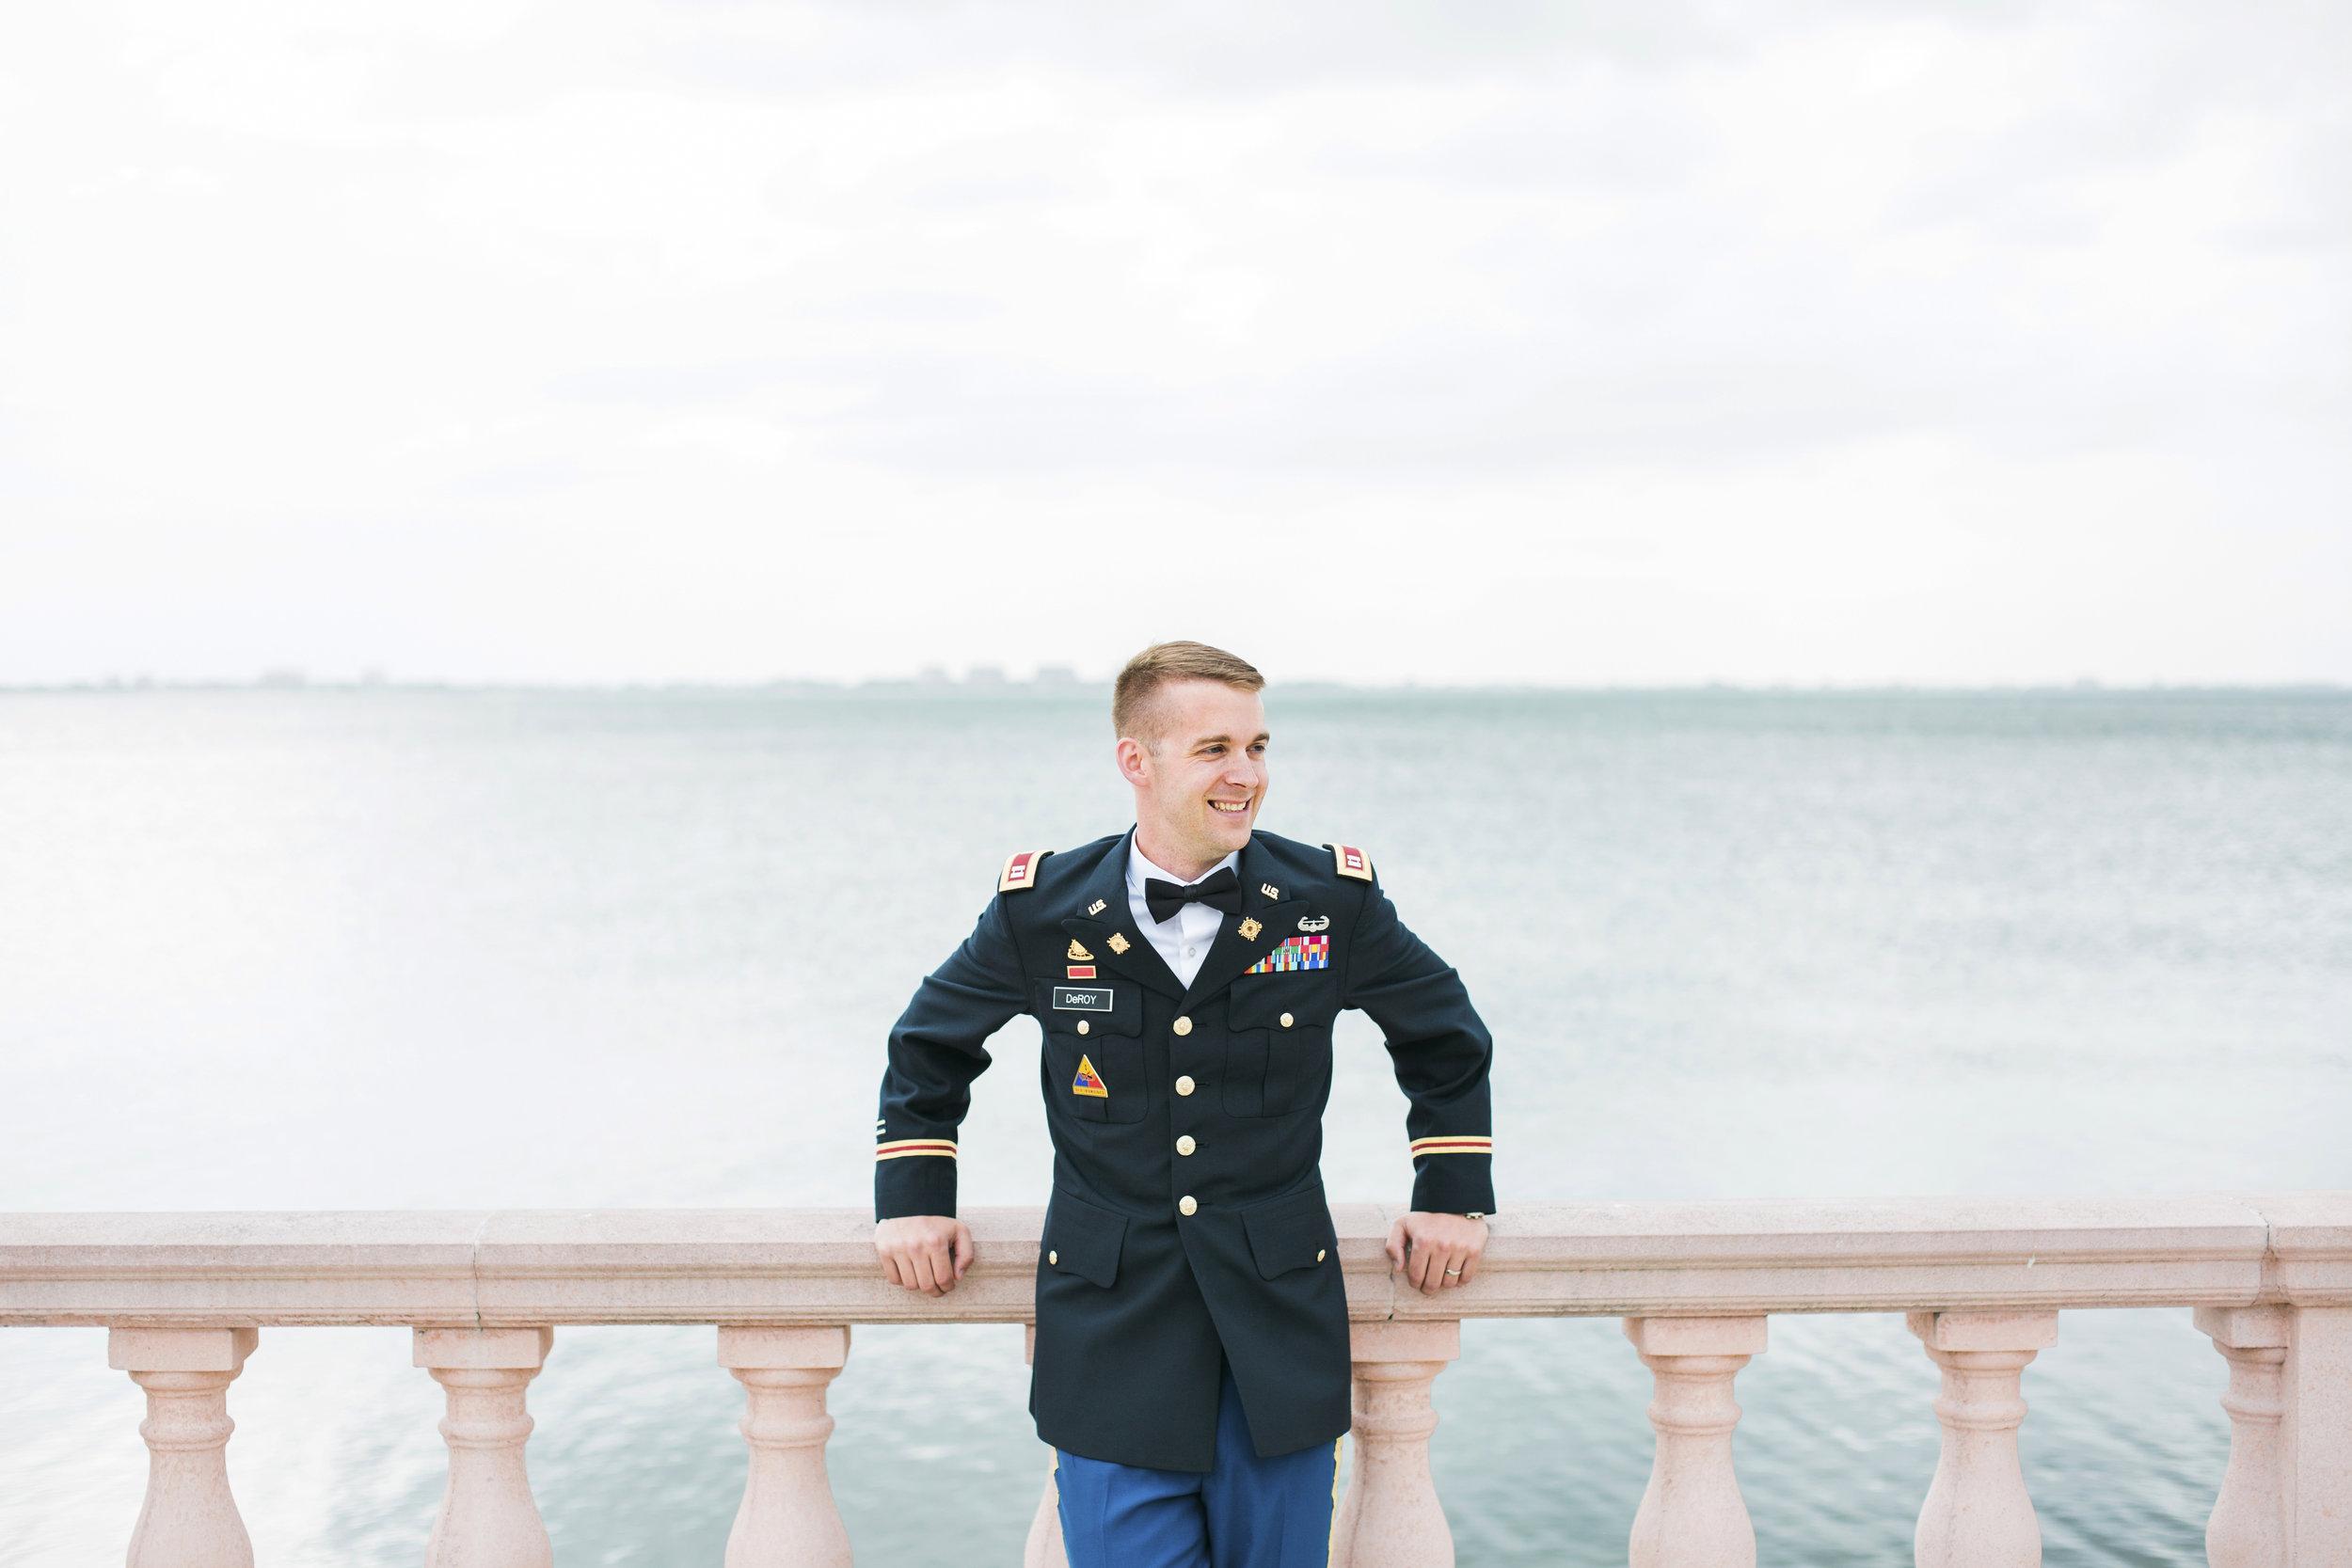 Rachel + Cole - Ringling Wedding Photography - Sarasota Wedding Photography - Emily & Co. Photography - 3. Couple (80).jpg